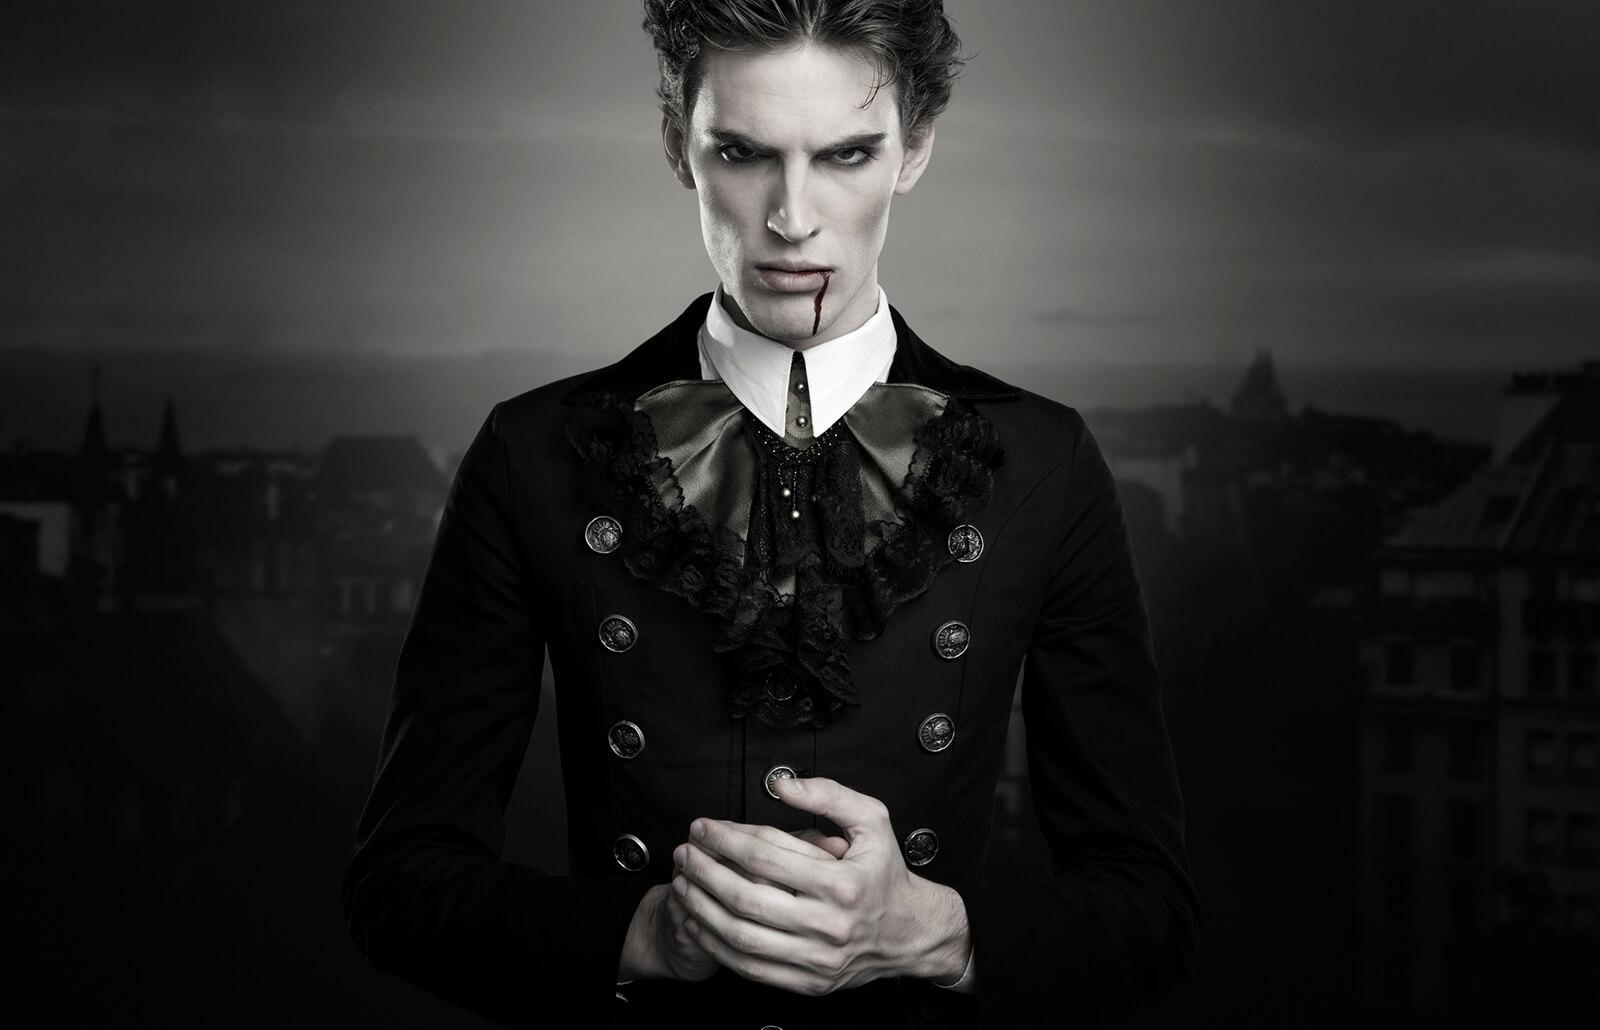 vampiri Kanchelsis nella forma del Dissoluto - by Karen Frazier, Nicholas Pell //paranormal.lovetoknow.com// © dell'autore